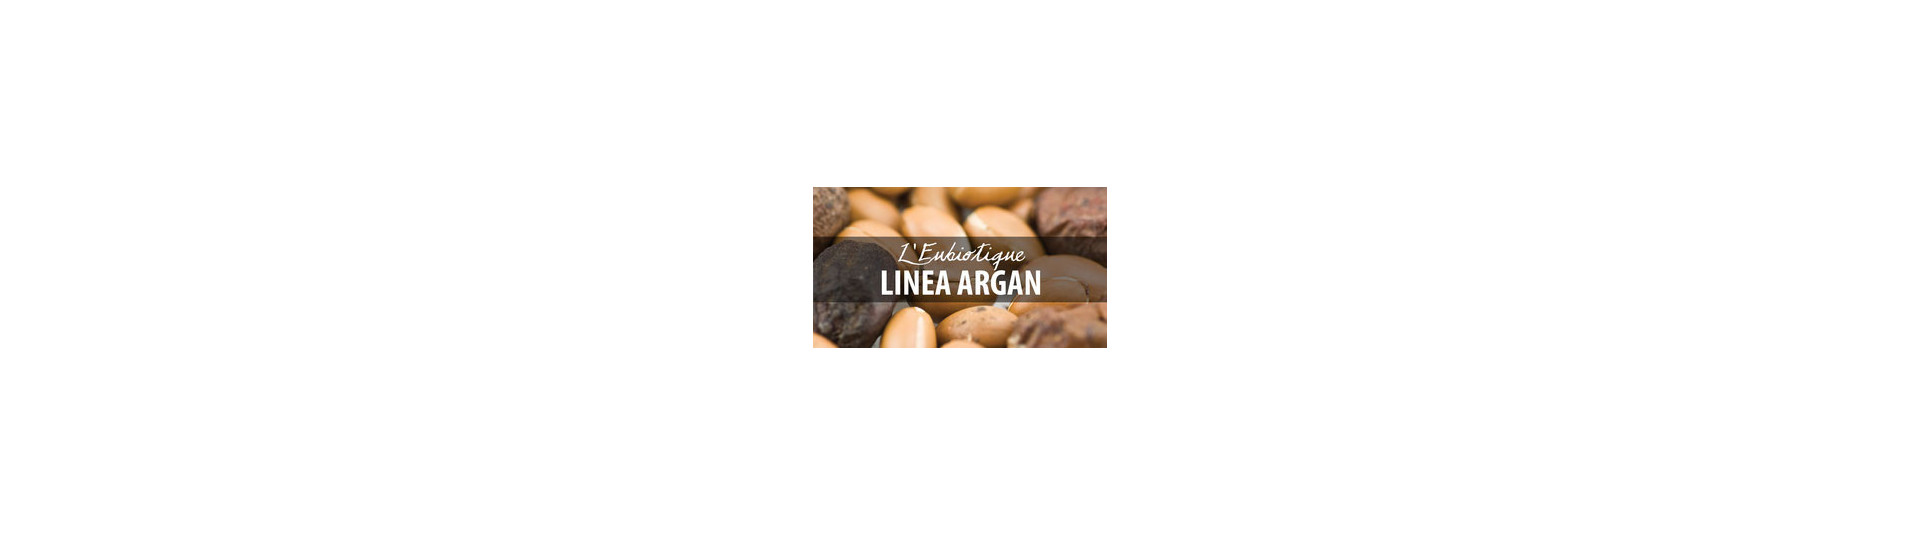 Linea Argan